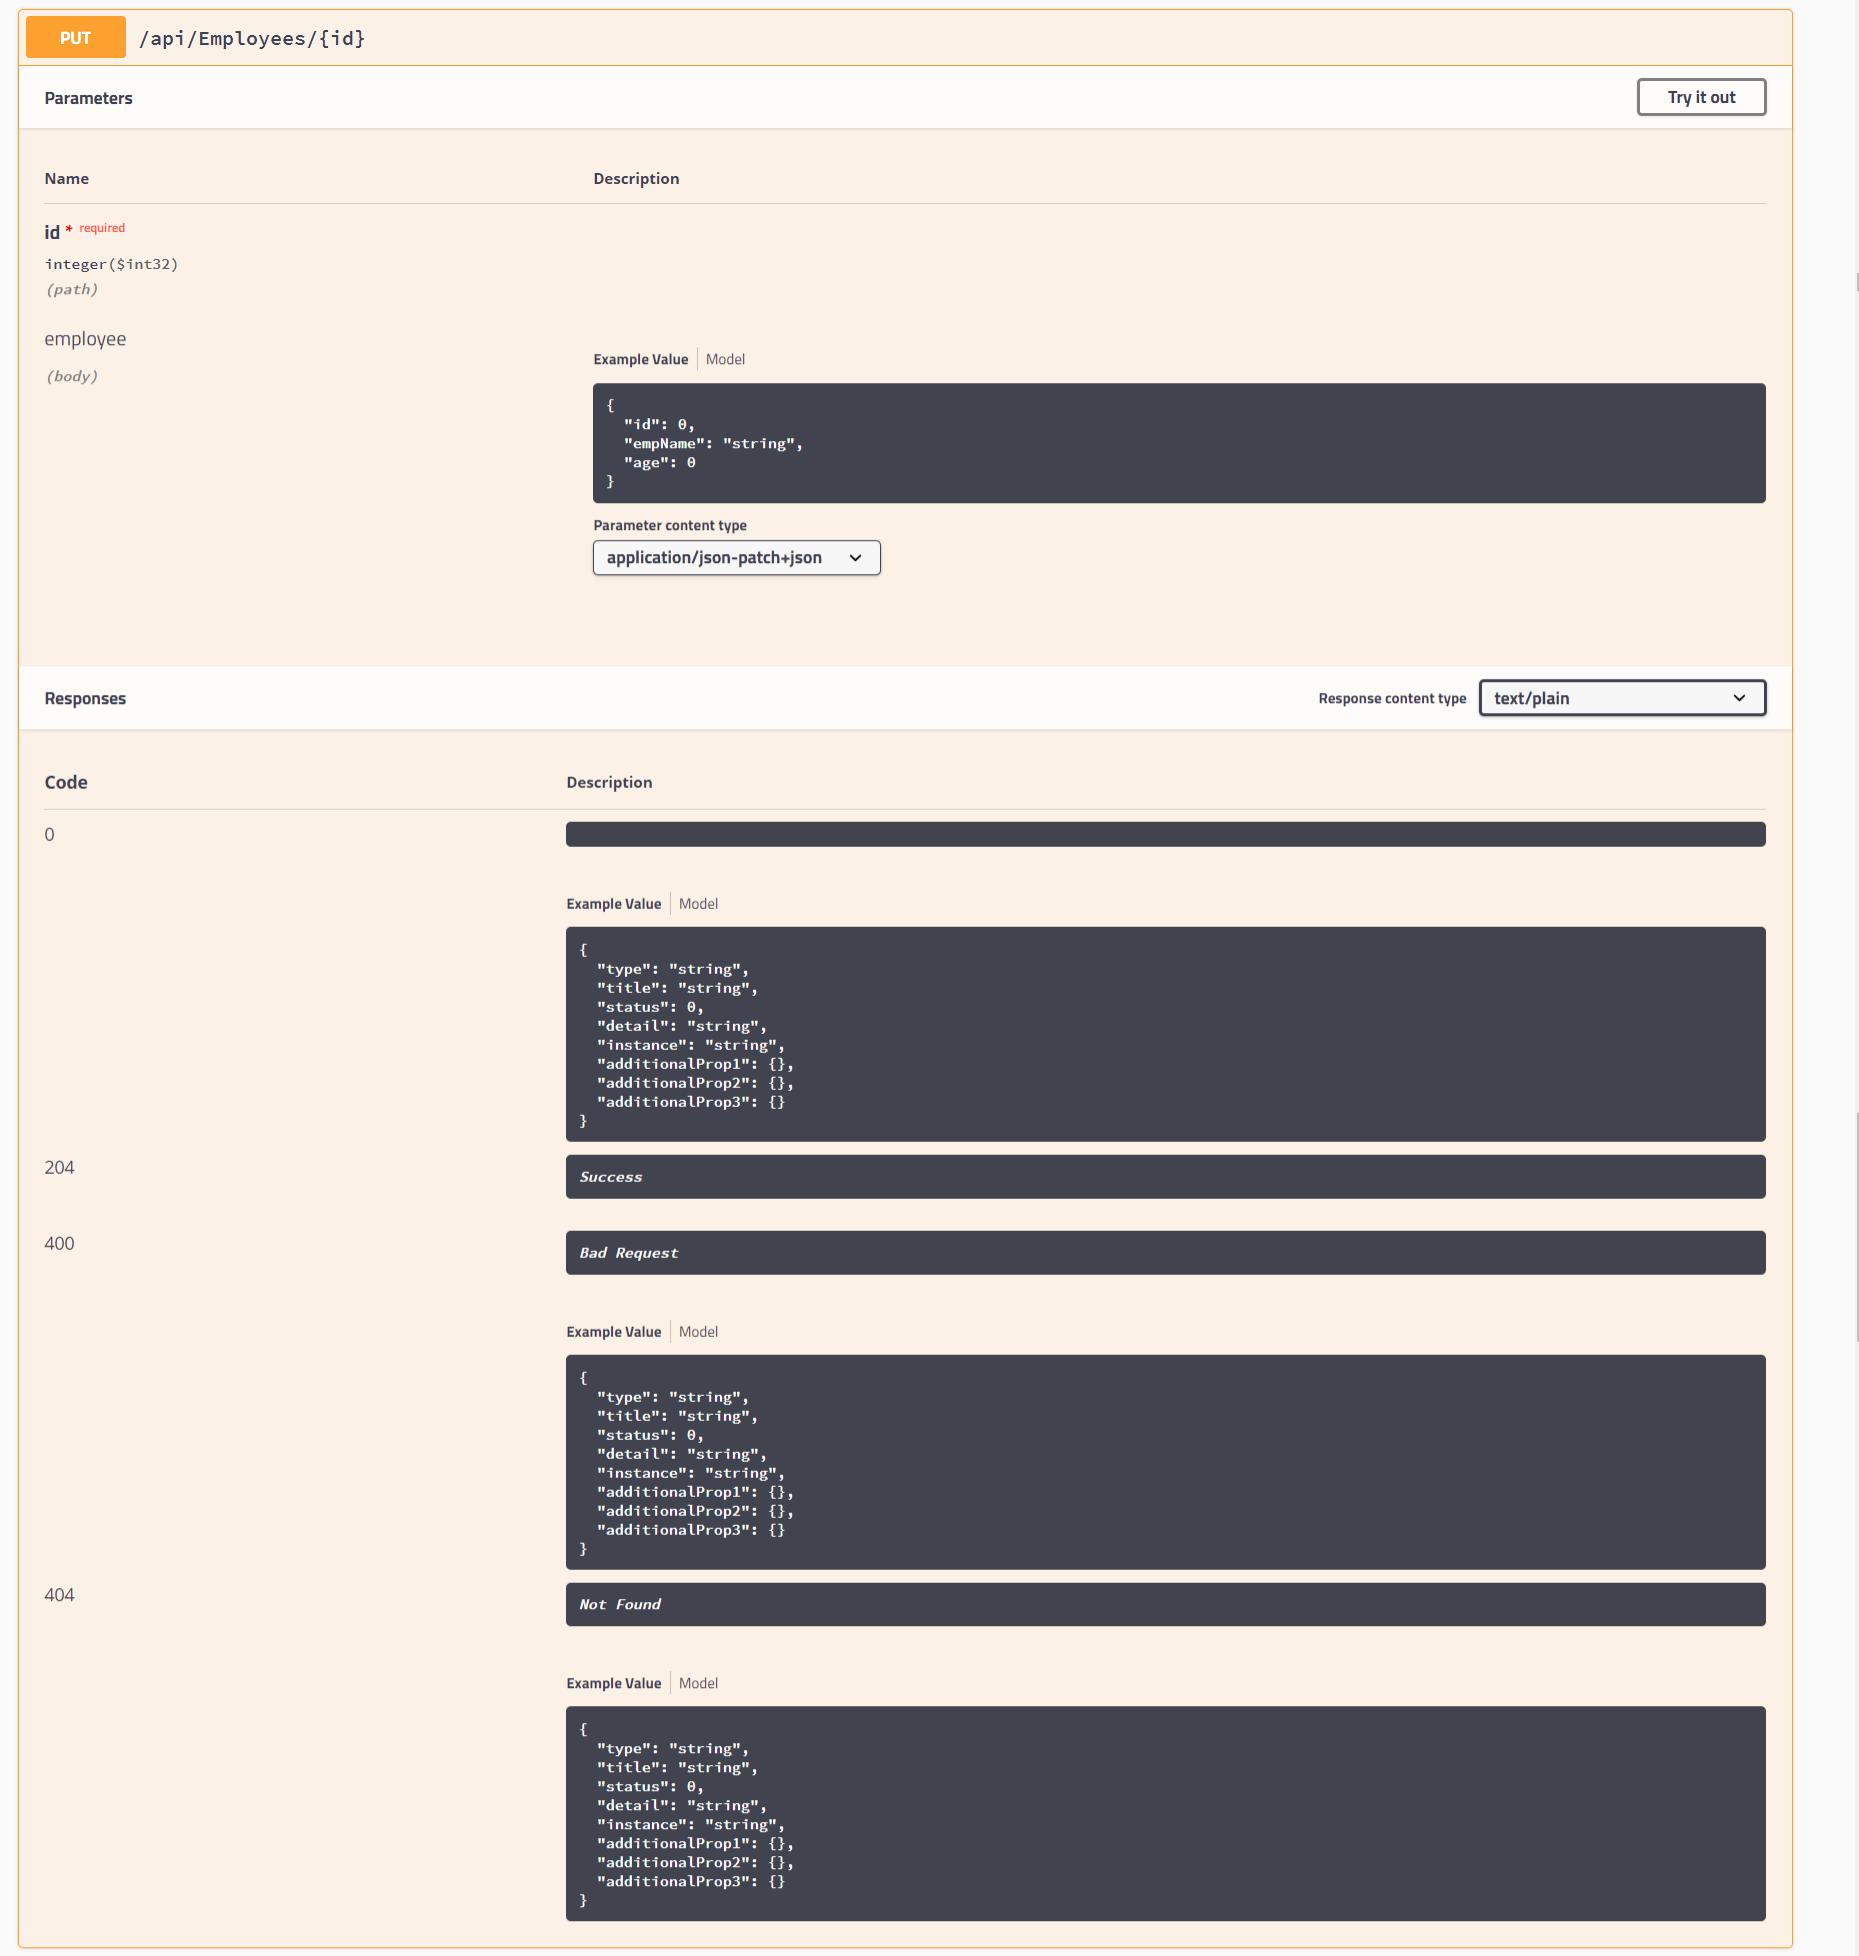 Swagger documentation after using API analyzers